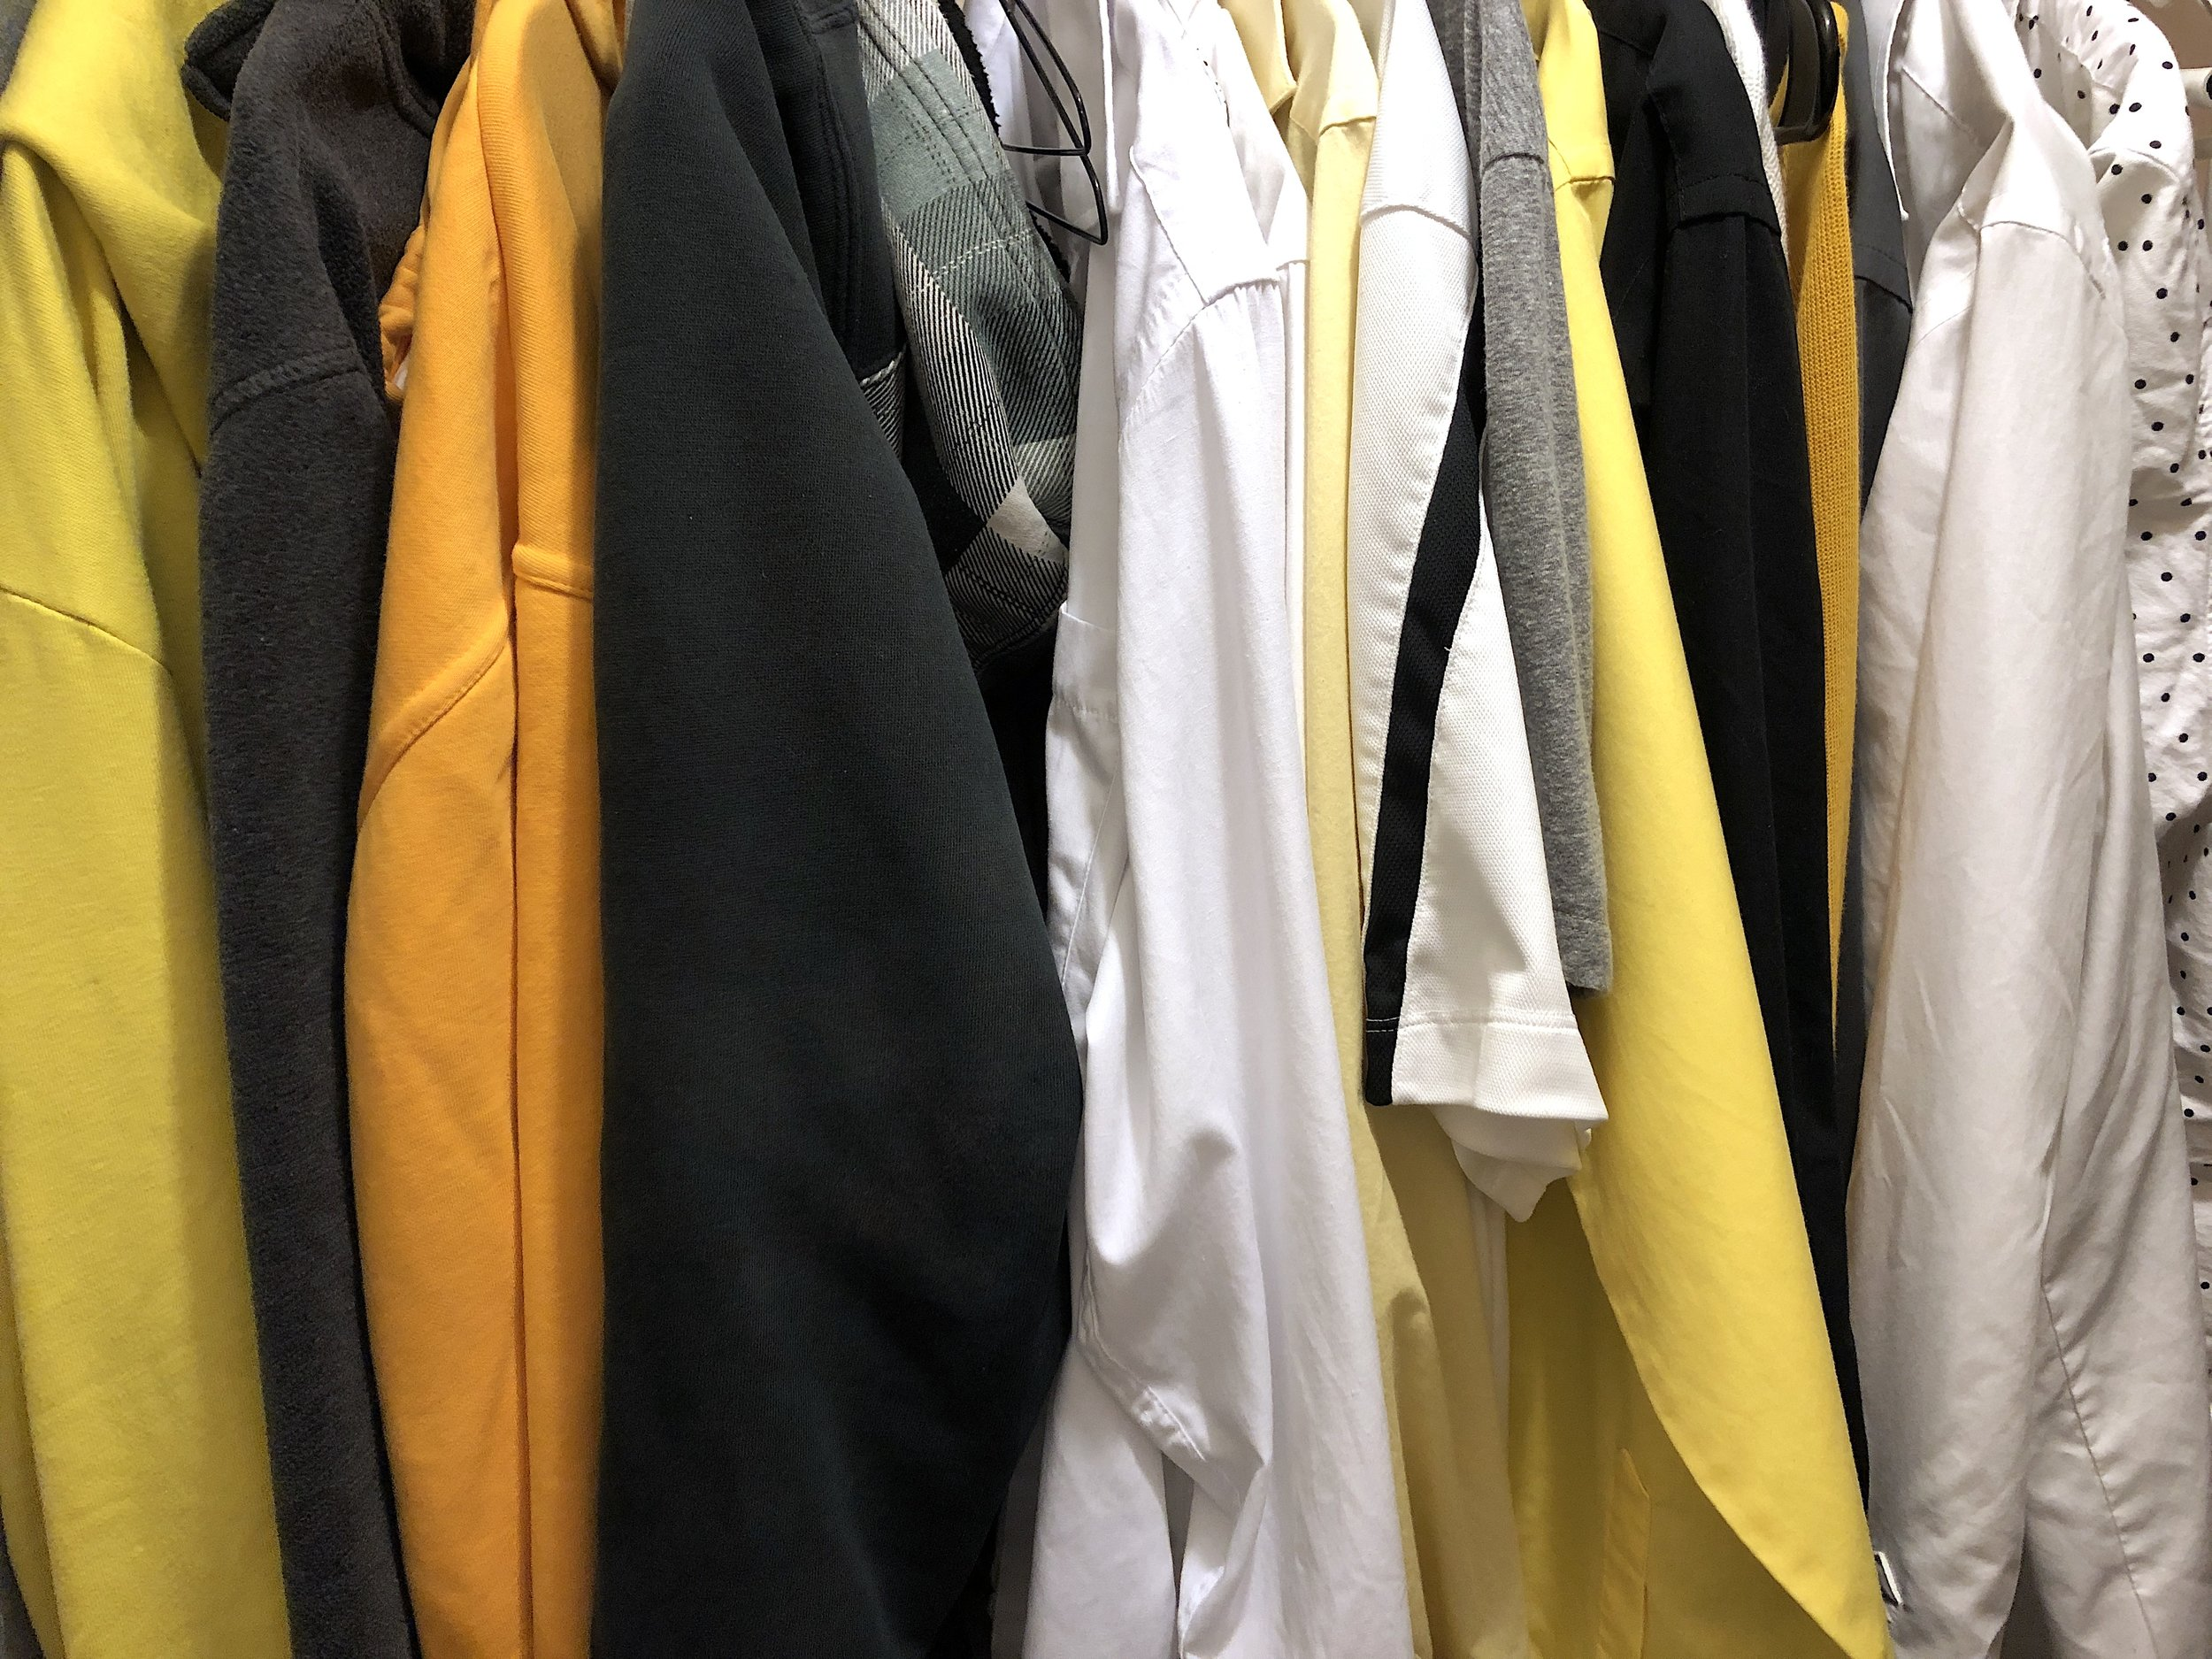 ryan meyer art closet clothes yellow black white